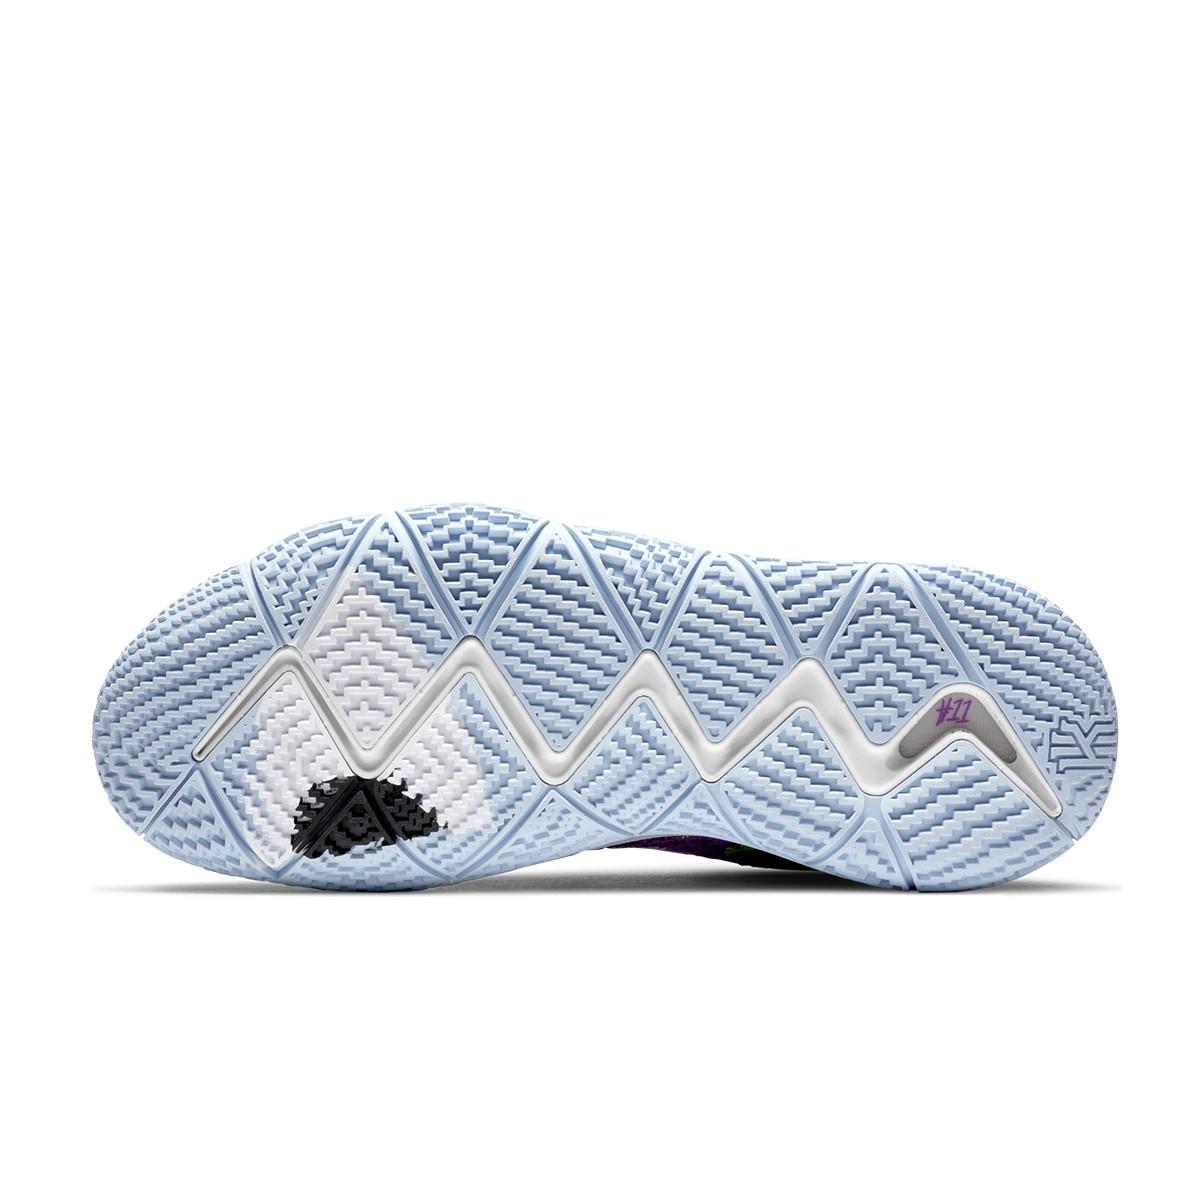 Nike Kyrie S2 Hybrid 'Pineapple'-CQ9323-900